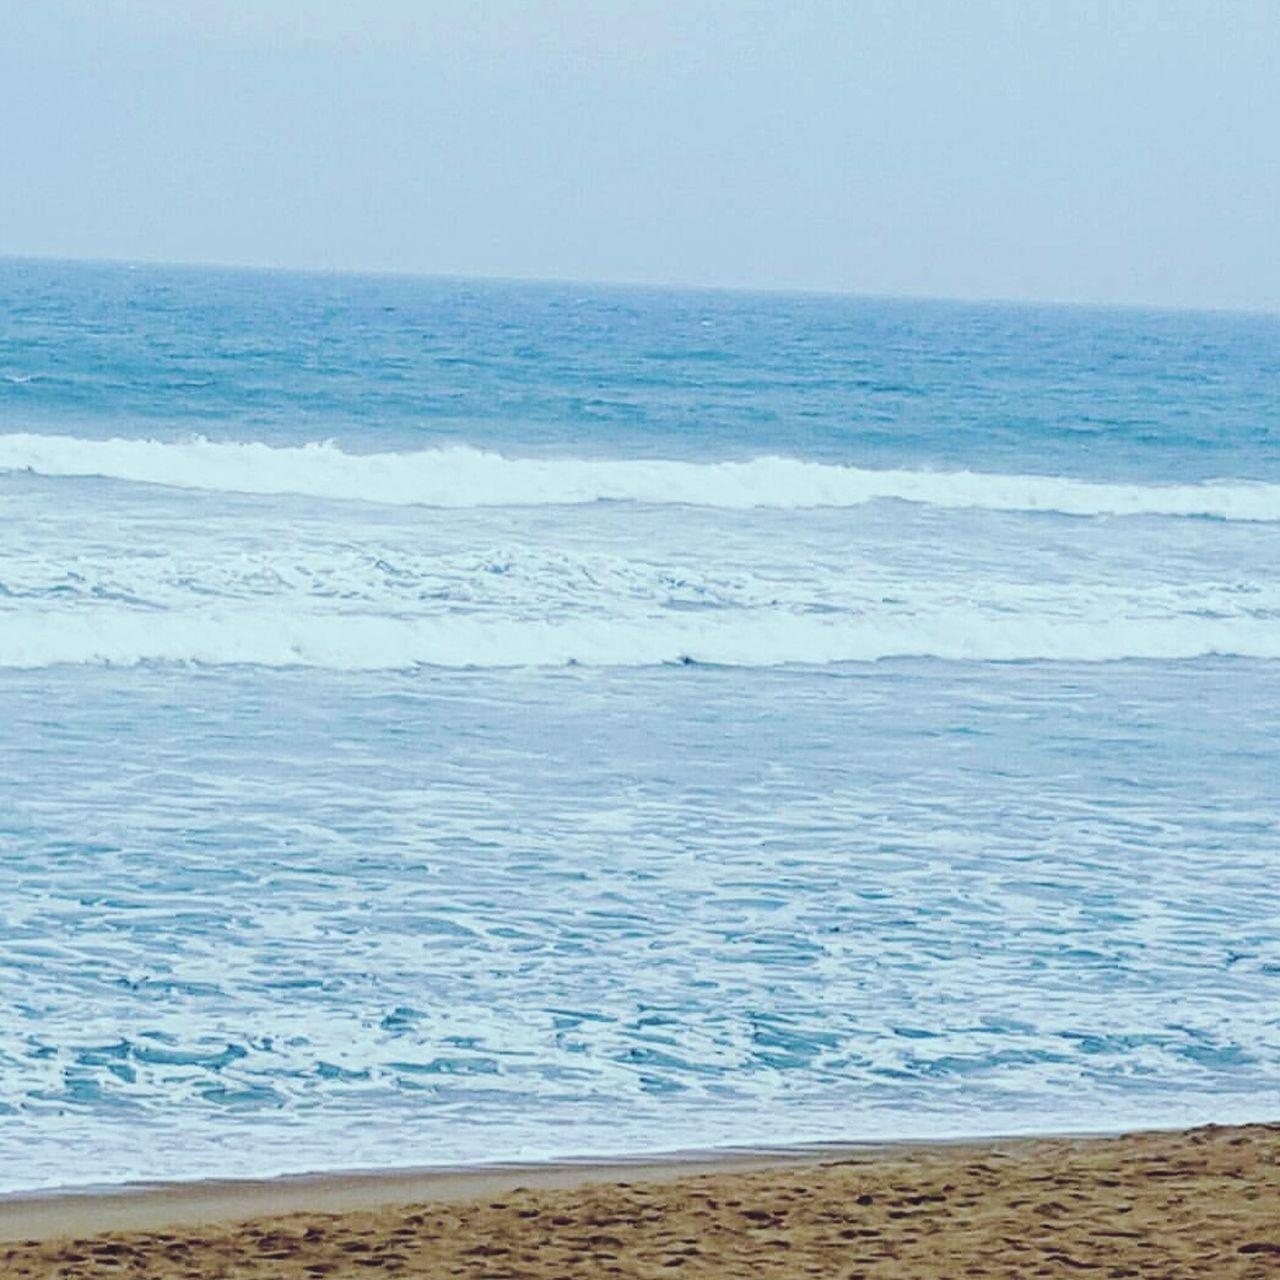 EyeEmNewHere Sea Beach Water Horizon Over Water Sand Wave Outdoors Nature Beauty In Nature Ocean ViewBeach Please Seashore Ocean Ocean Life Beach Life